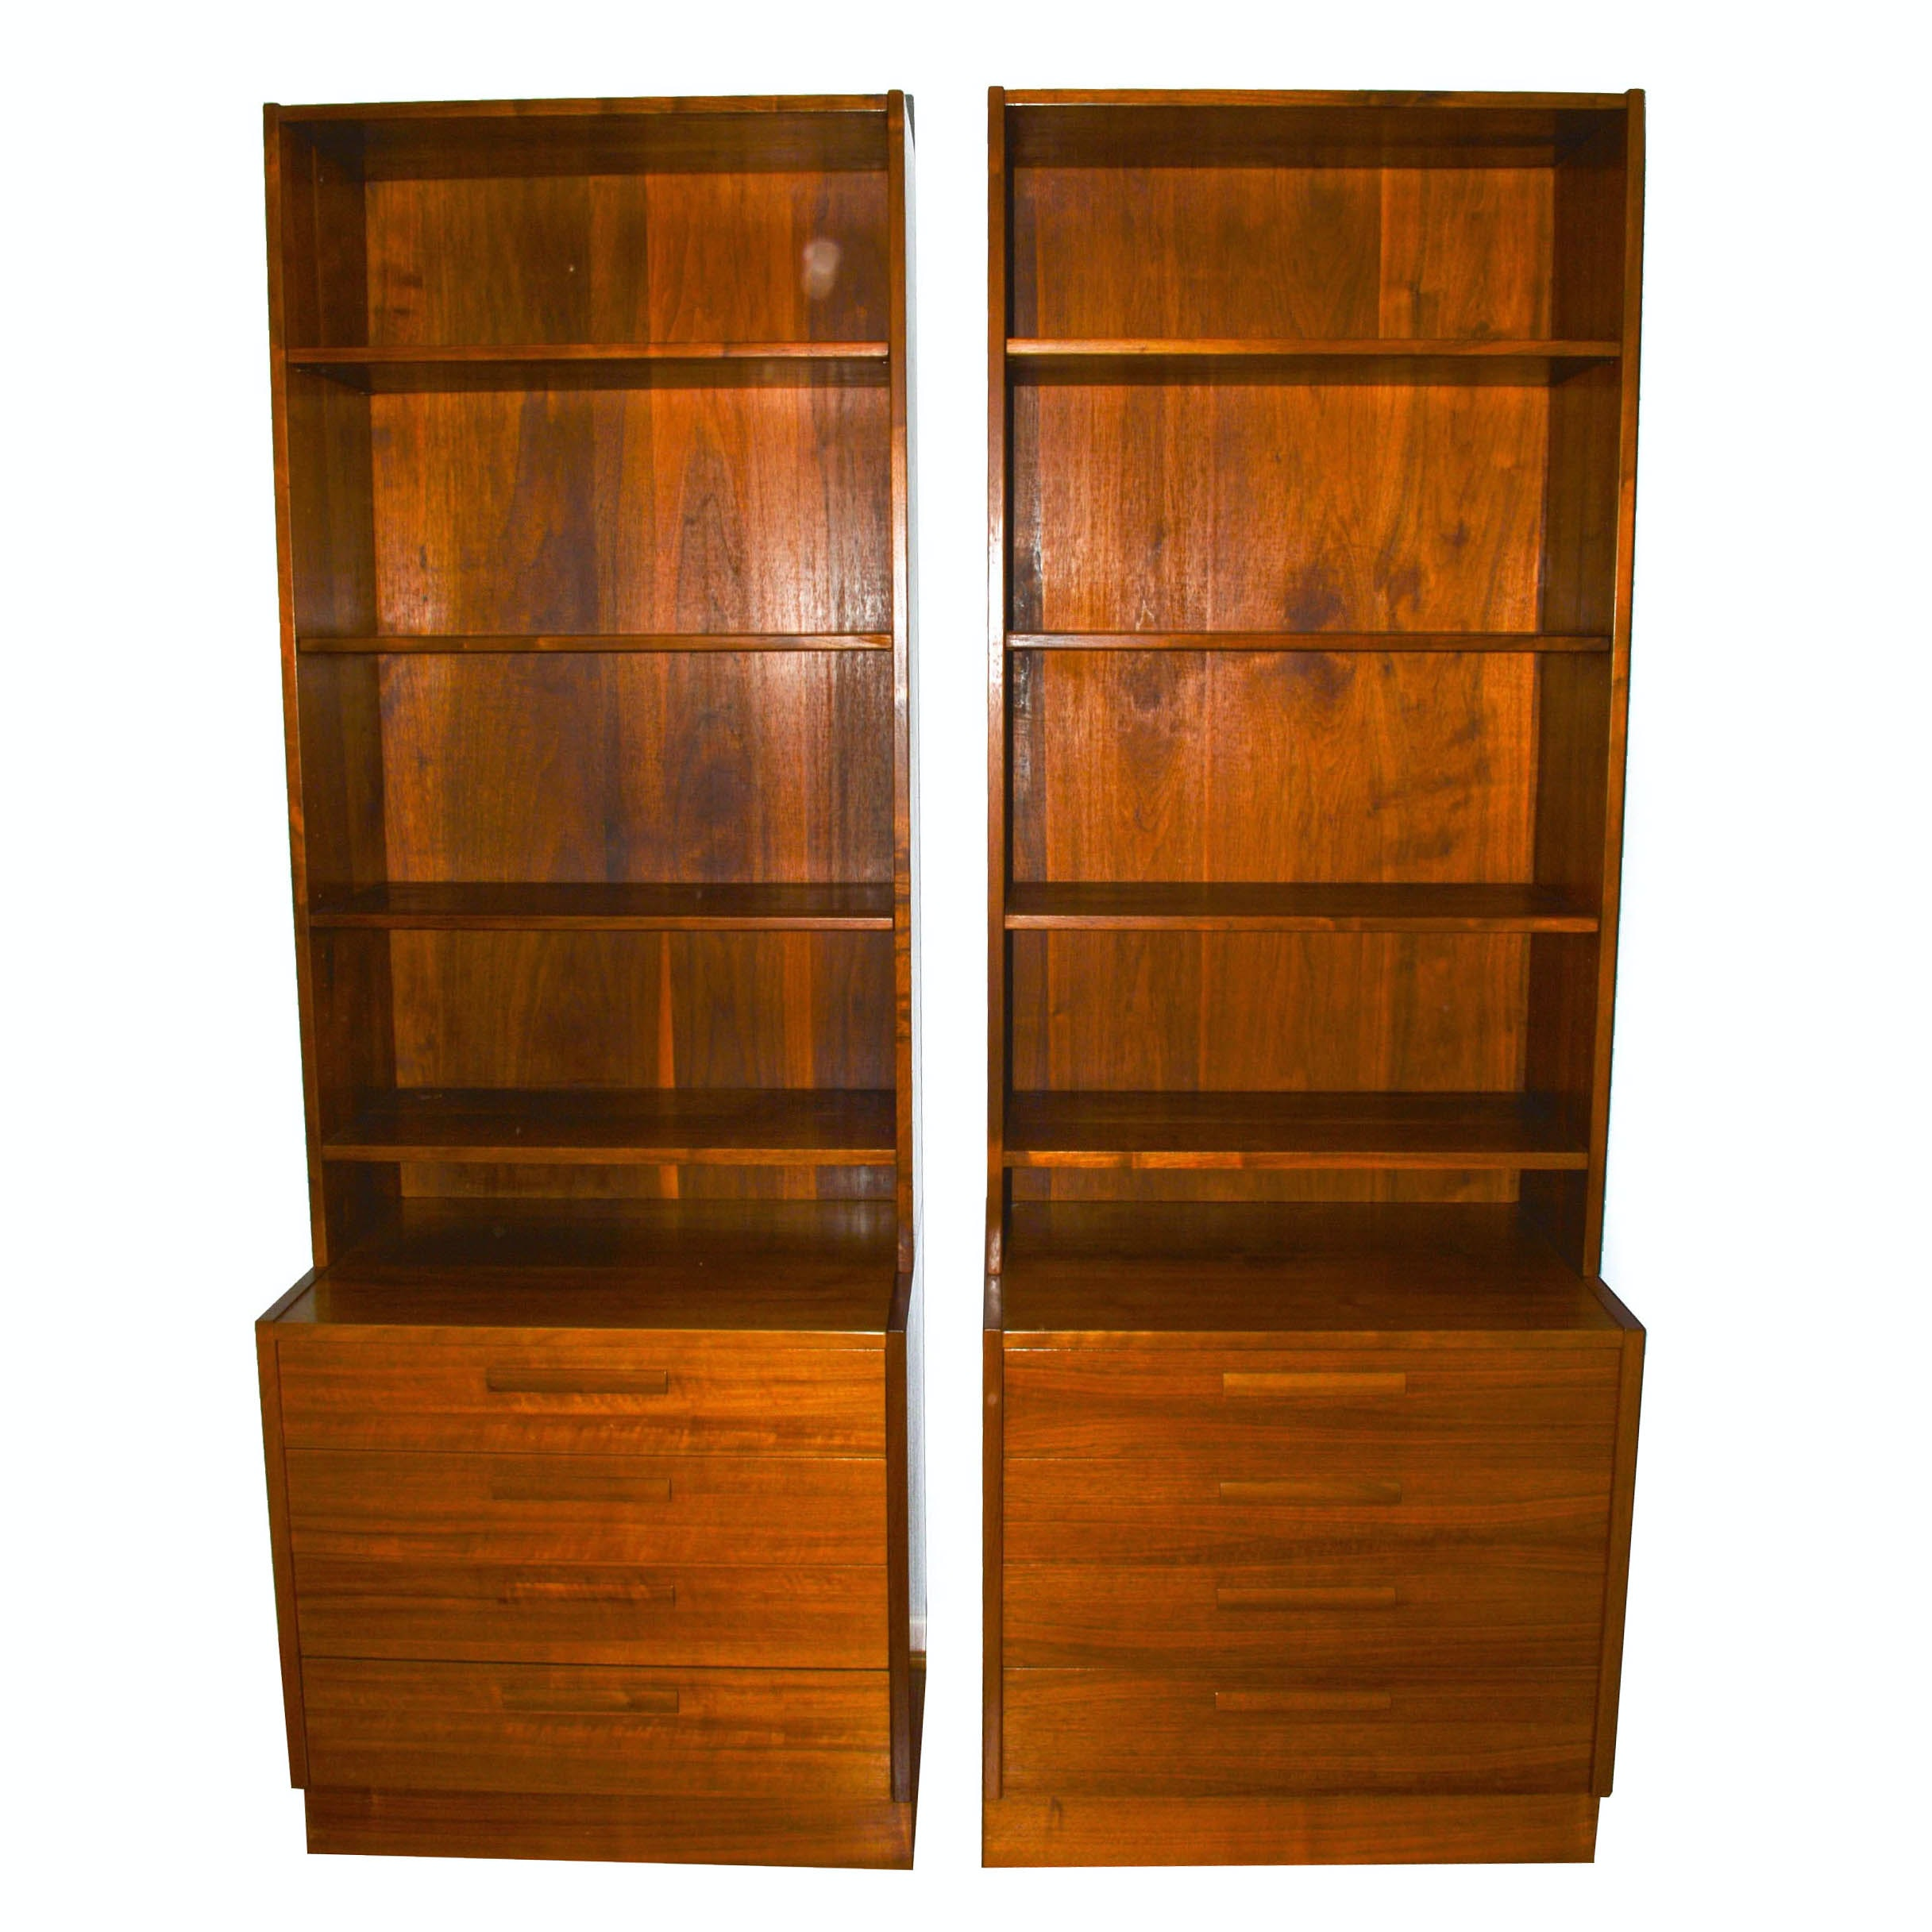 Troeds-Bjärnum Swedish Modern Bookcases